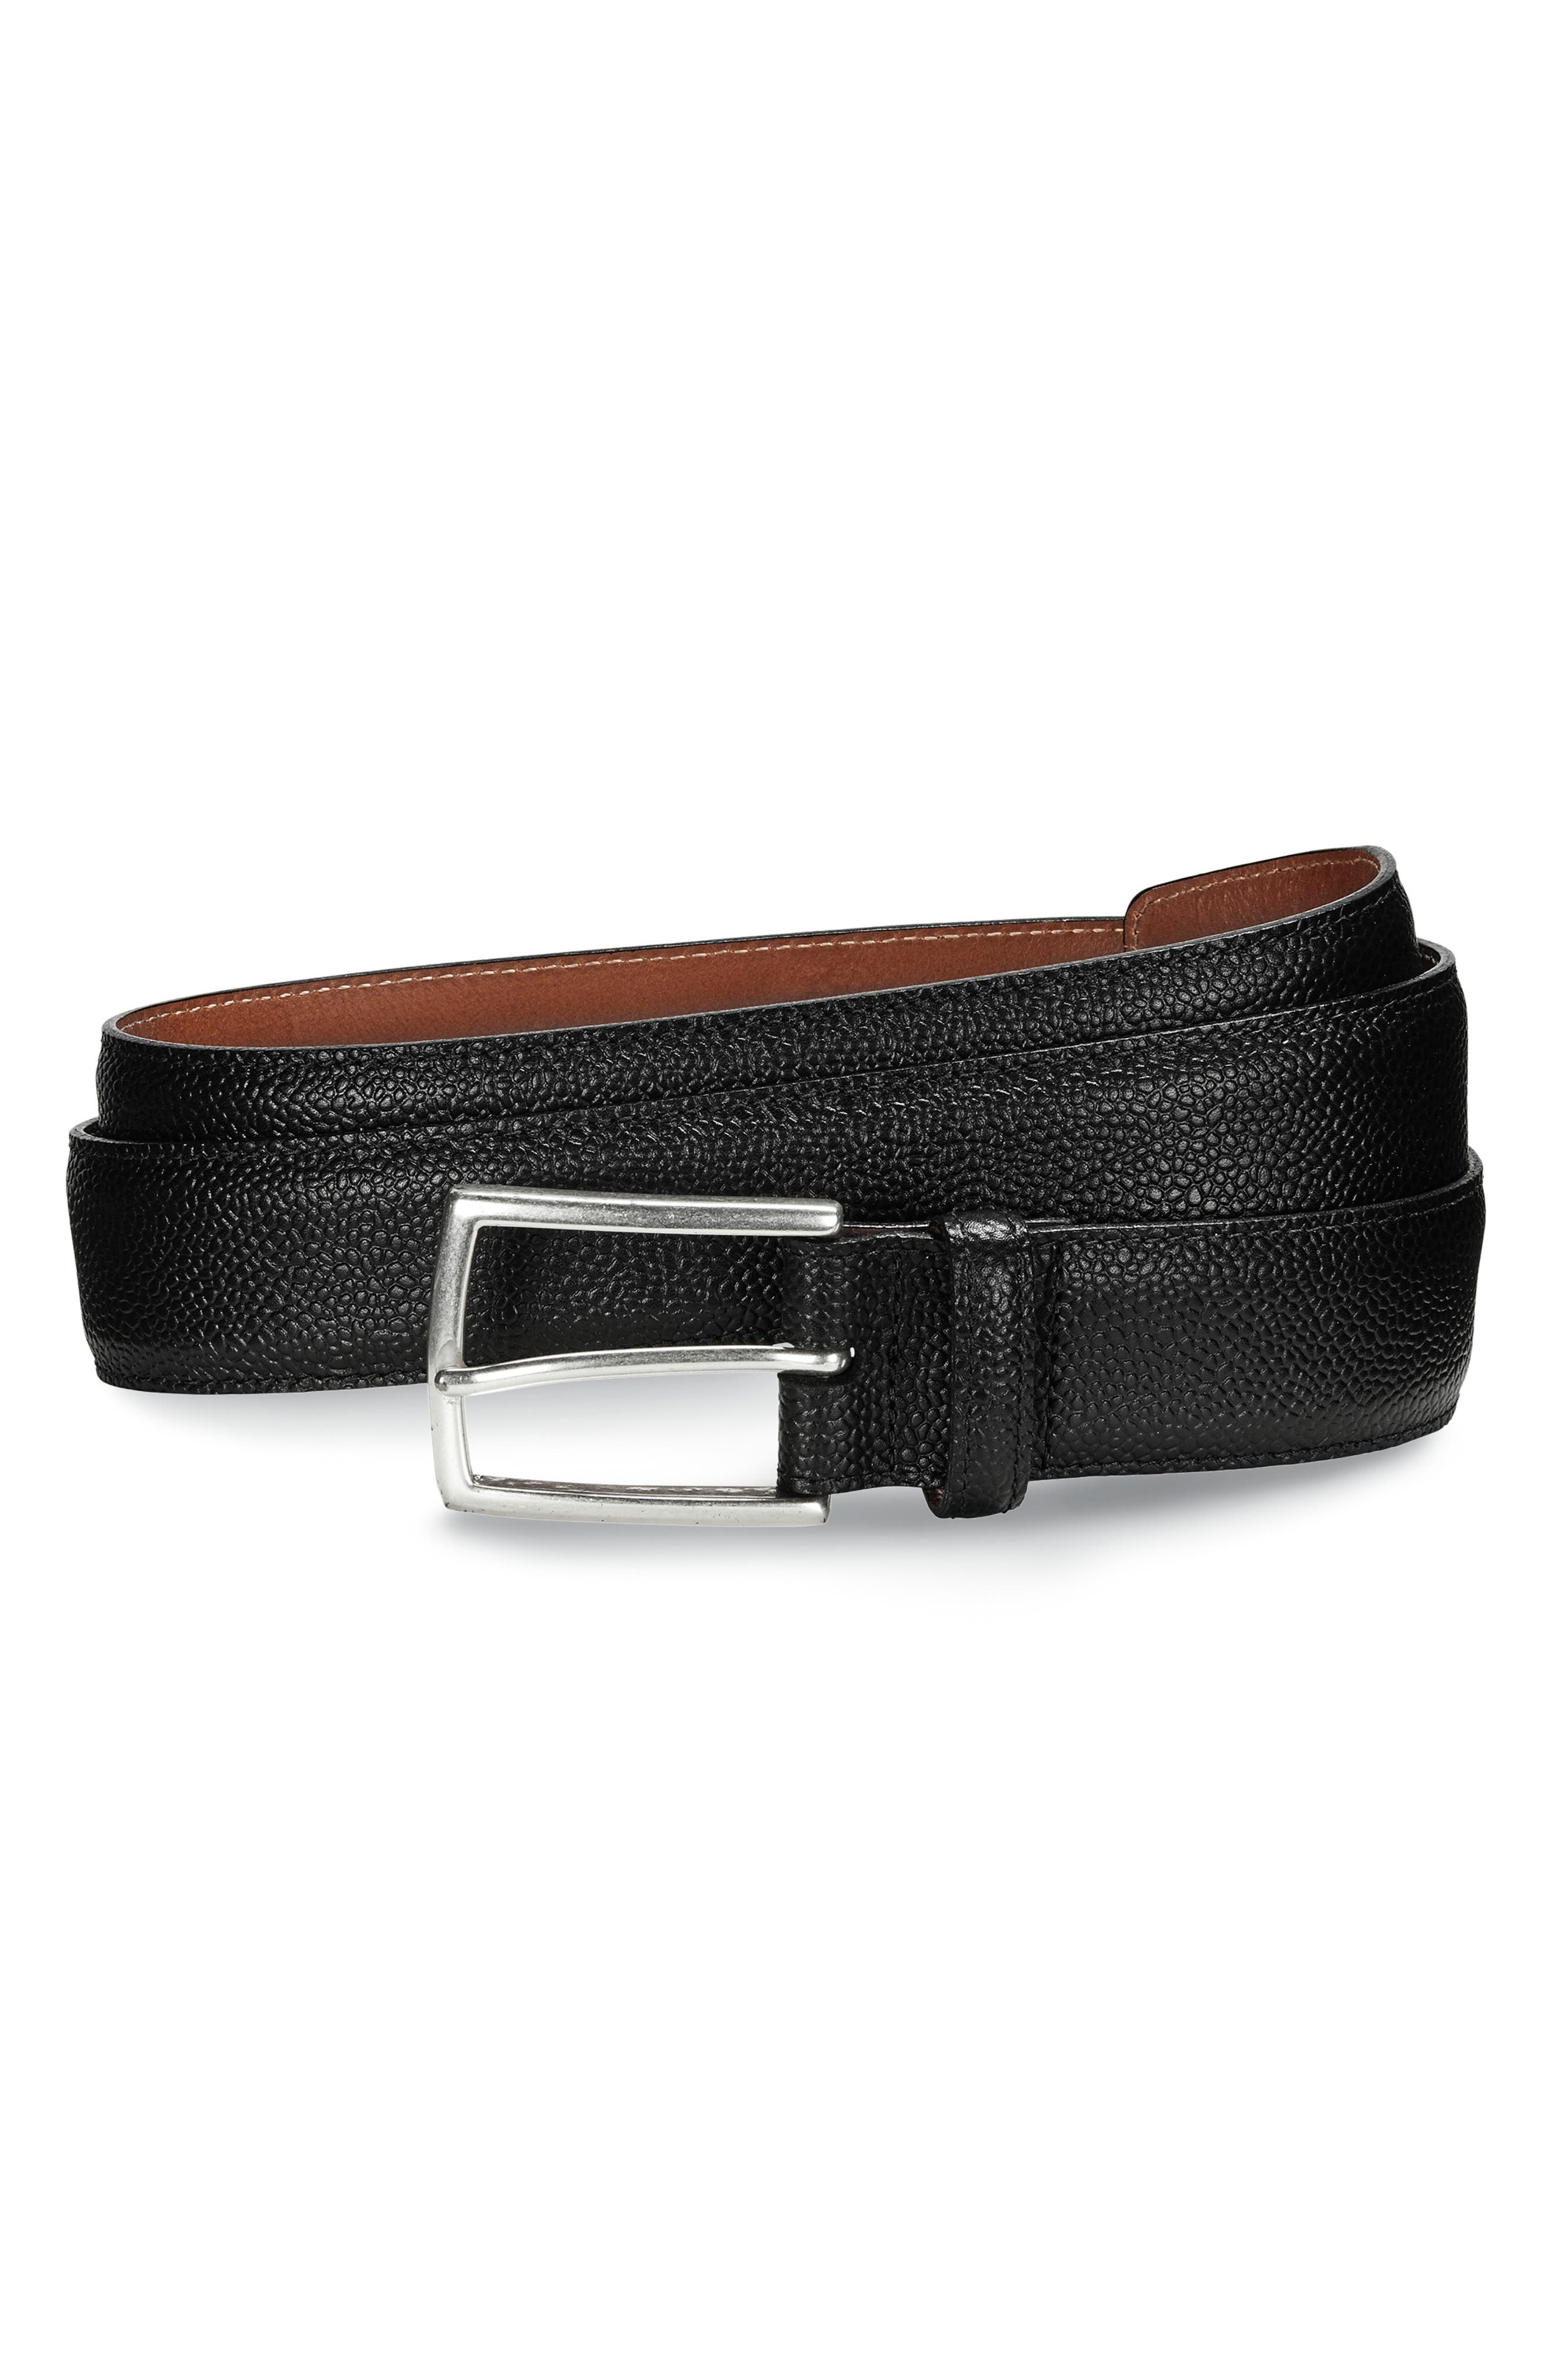 ALLEN EDMONDS Allen Edmoinds Hara Avenue Leather Belt, Main, color, BLACK